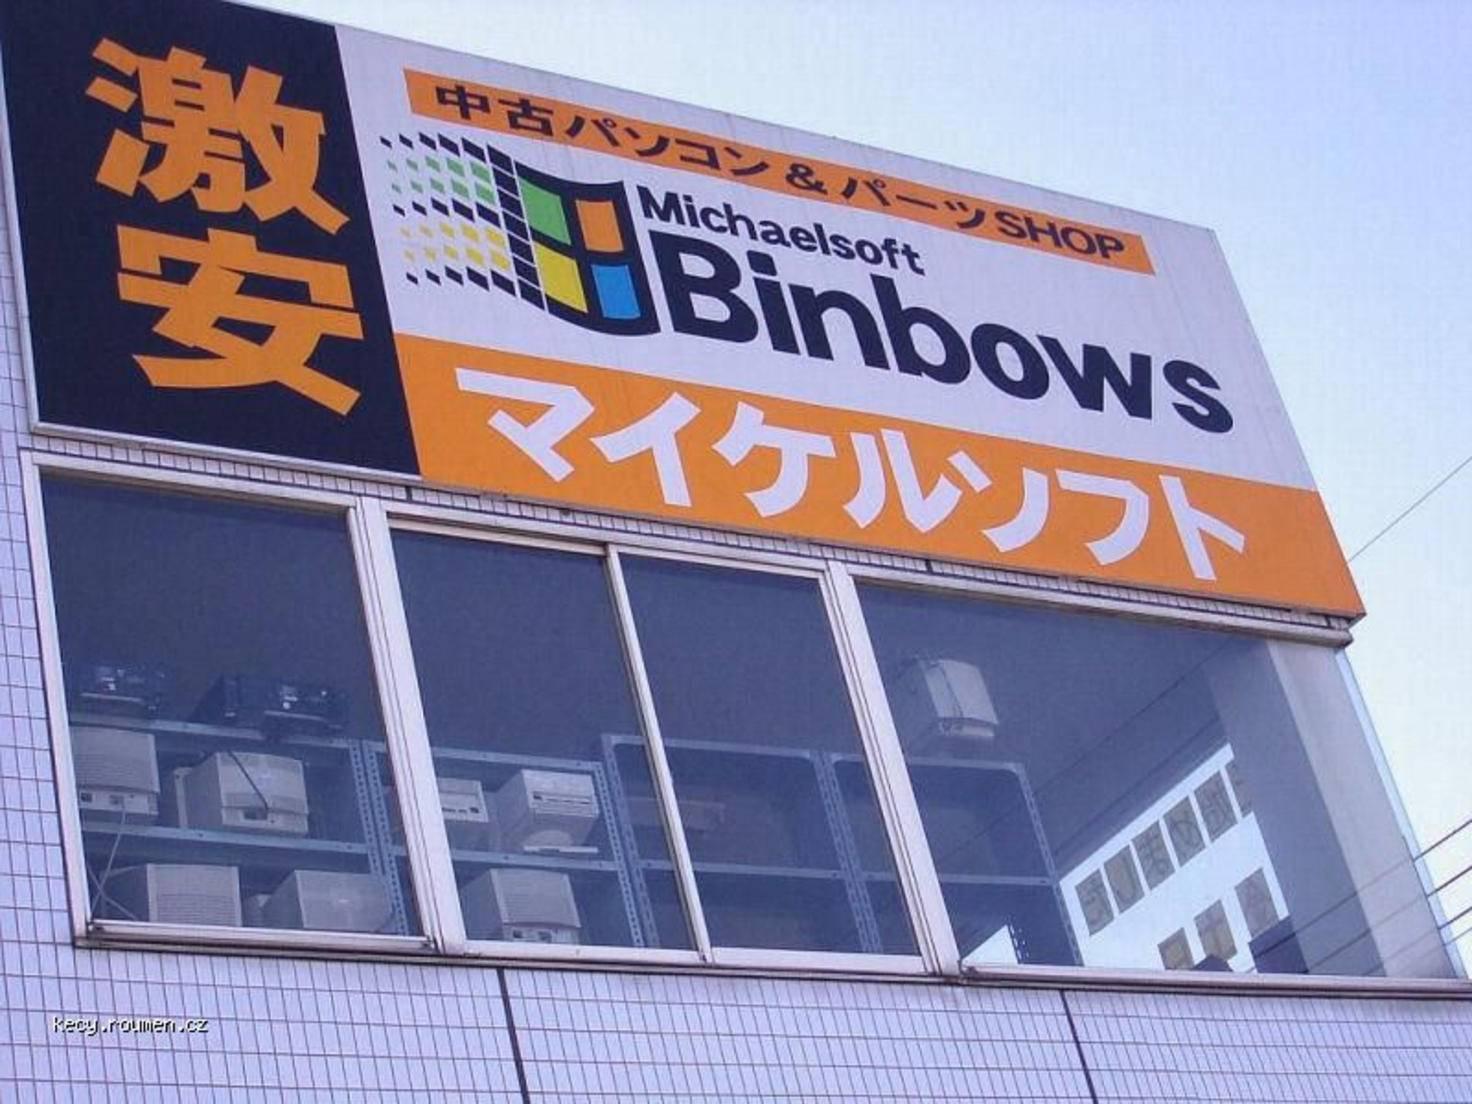 Michaelsoft-Binbows